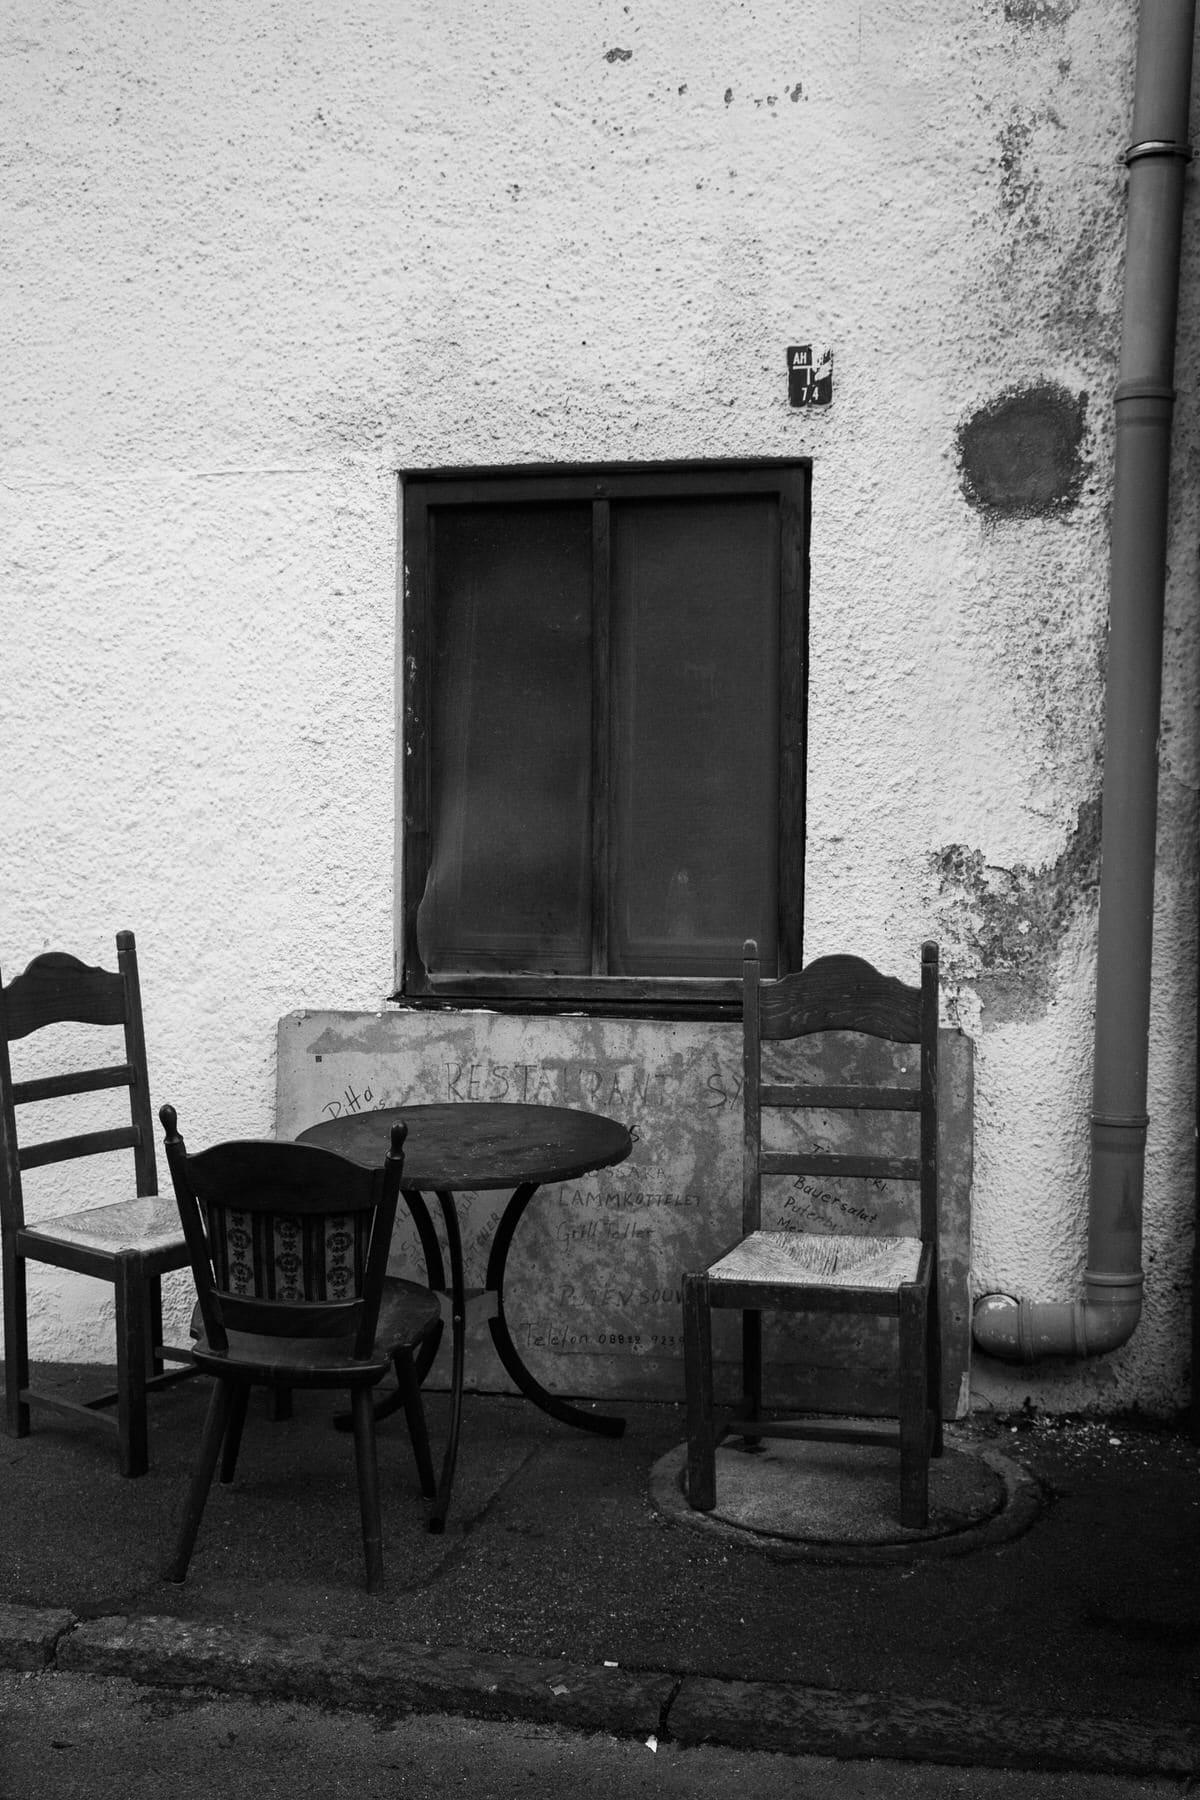 Garmisch_Germany-black-and-white-fine-art-photography-by-Studio-L-photographer-Laura-Schneider-_3664